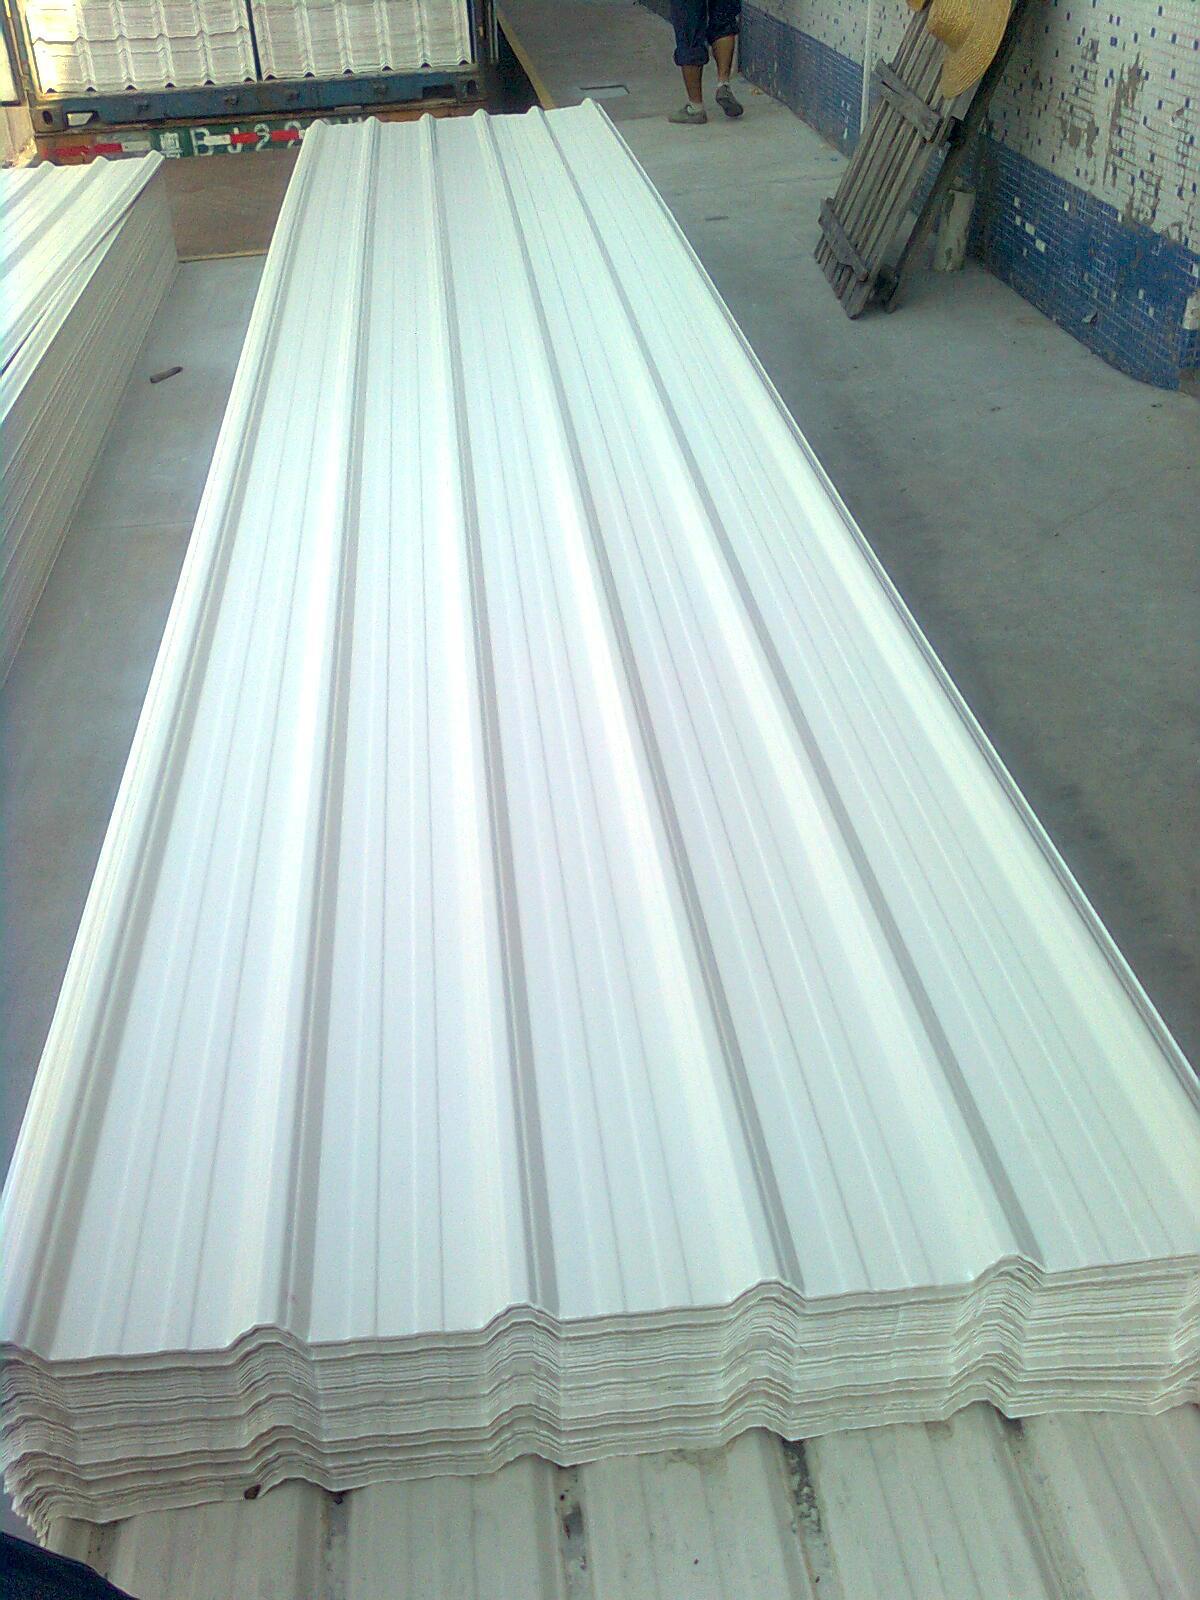 HONGBO PVC anti corrosive Roofing Tile 4